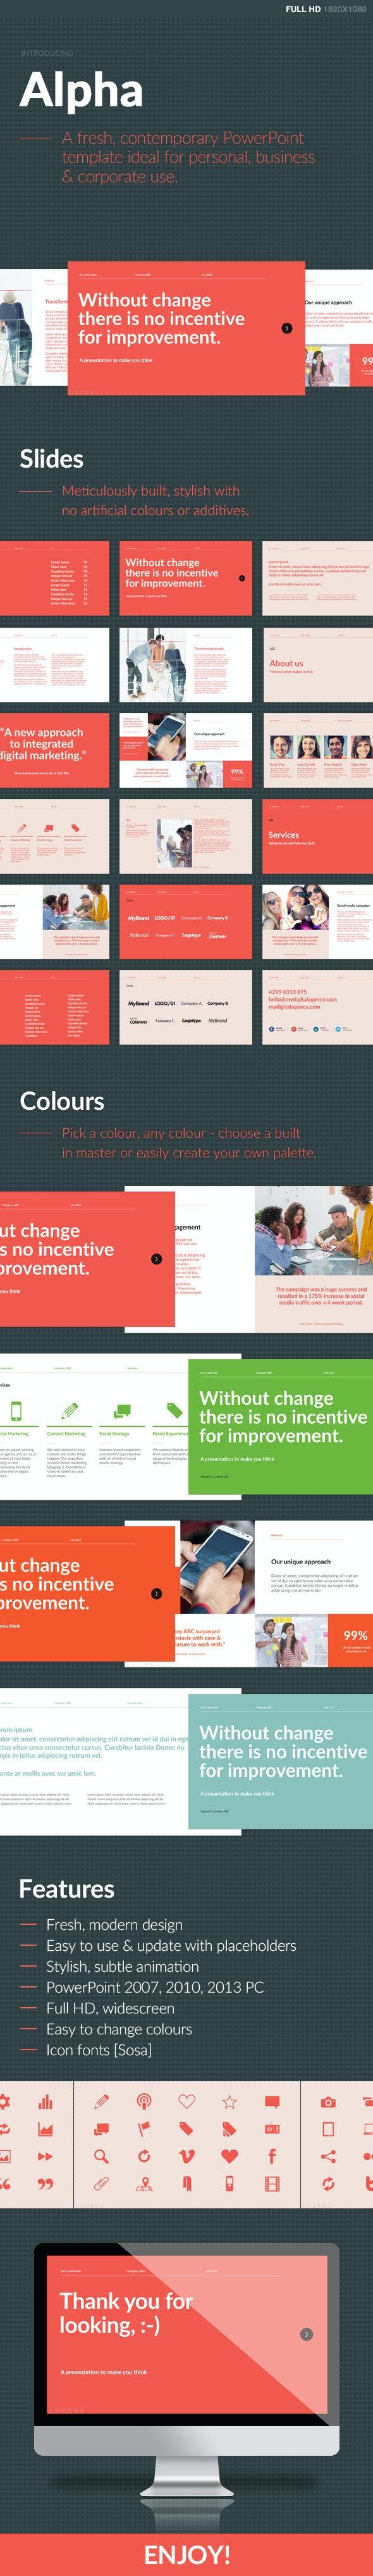 Alpha PowerPoint Template - PowerPoint Templates Presentation Templates